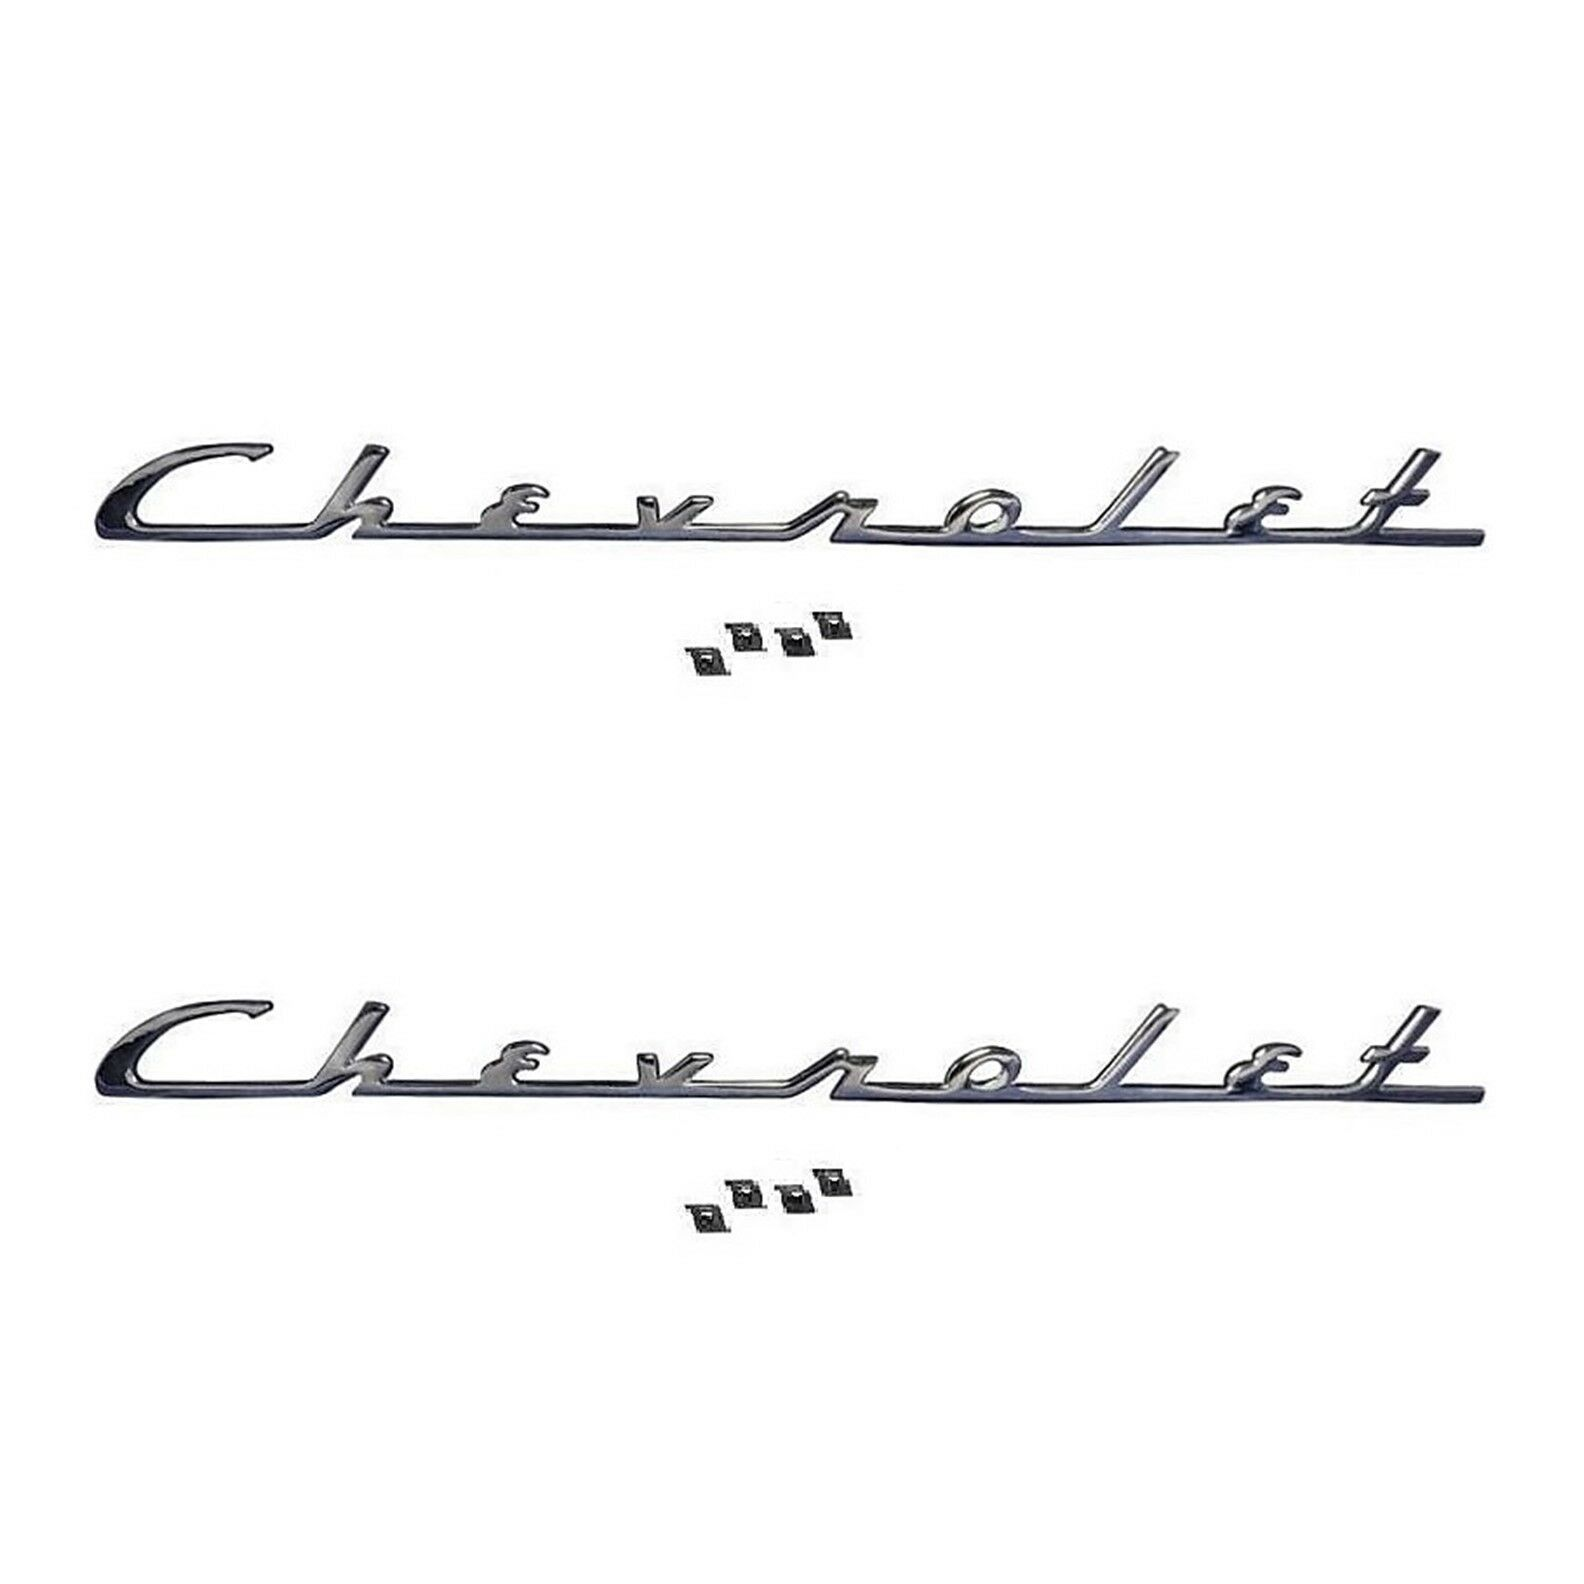 1954 54 Chevy Chevrolet Chrome Trunk Emblem Script Bel Air